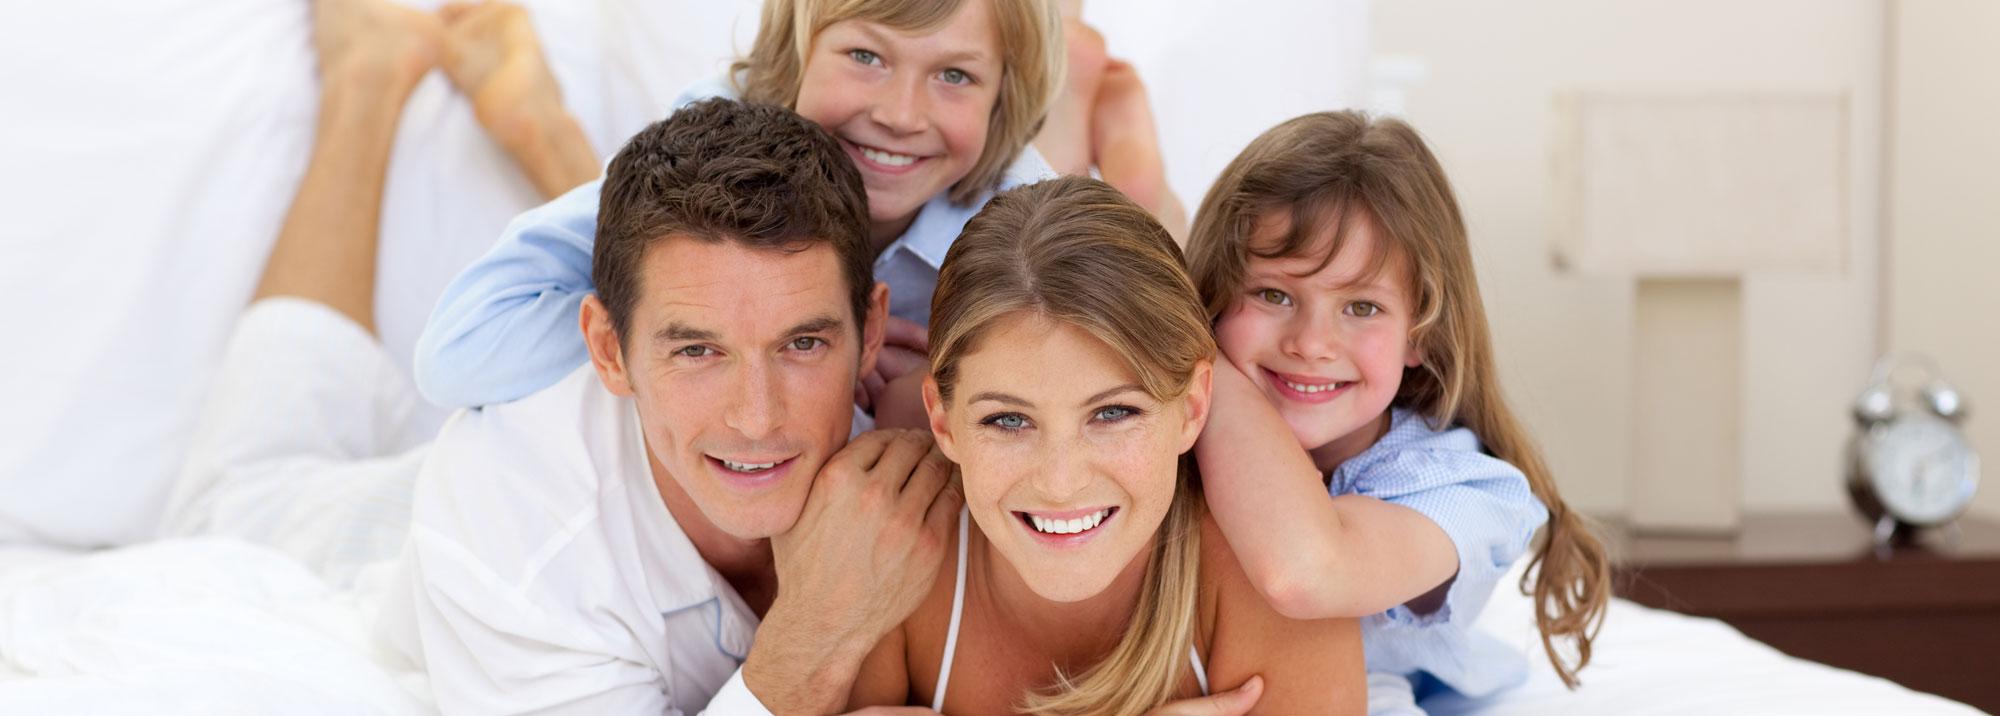 Hotel Lido Cattolica offerte famiglia